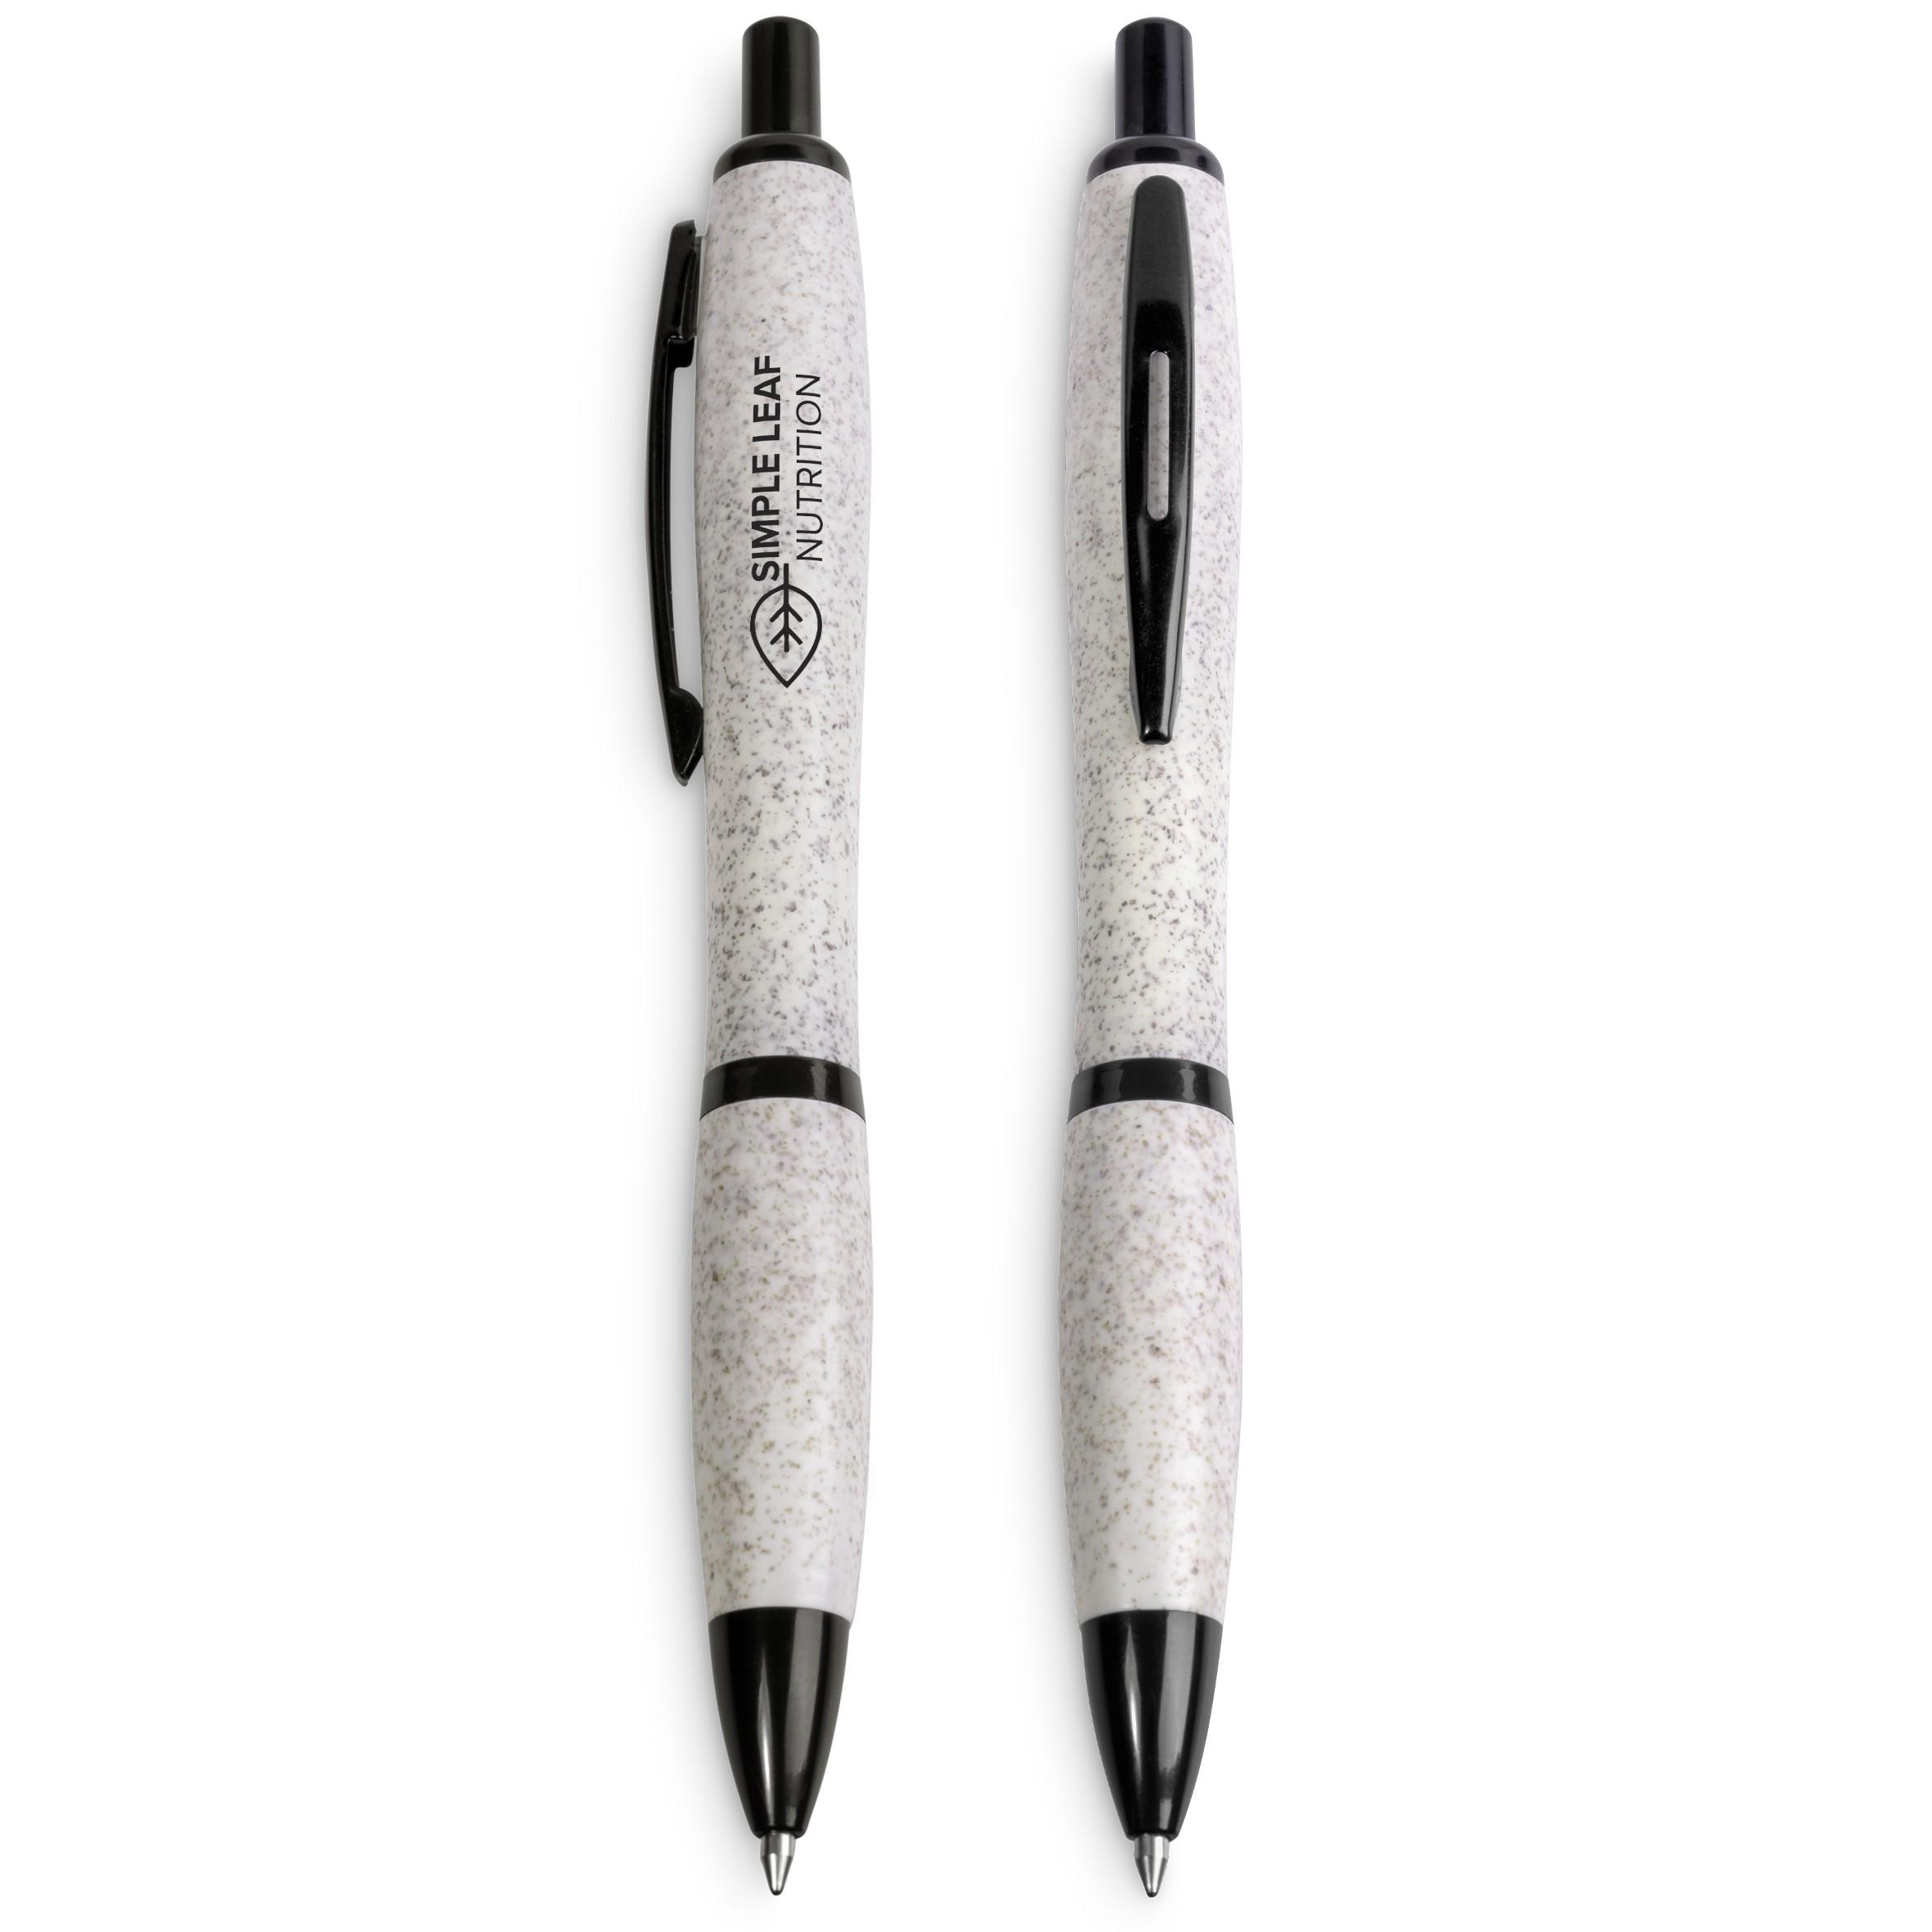 Okiyo Vinca Wheat Straw Ball Pen